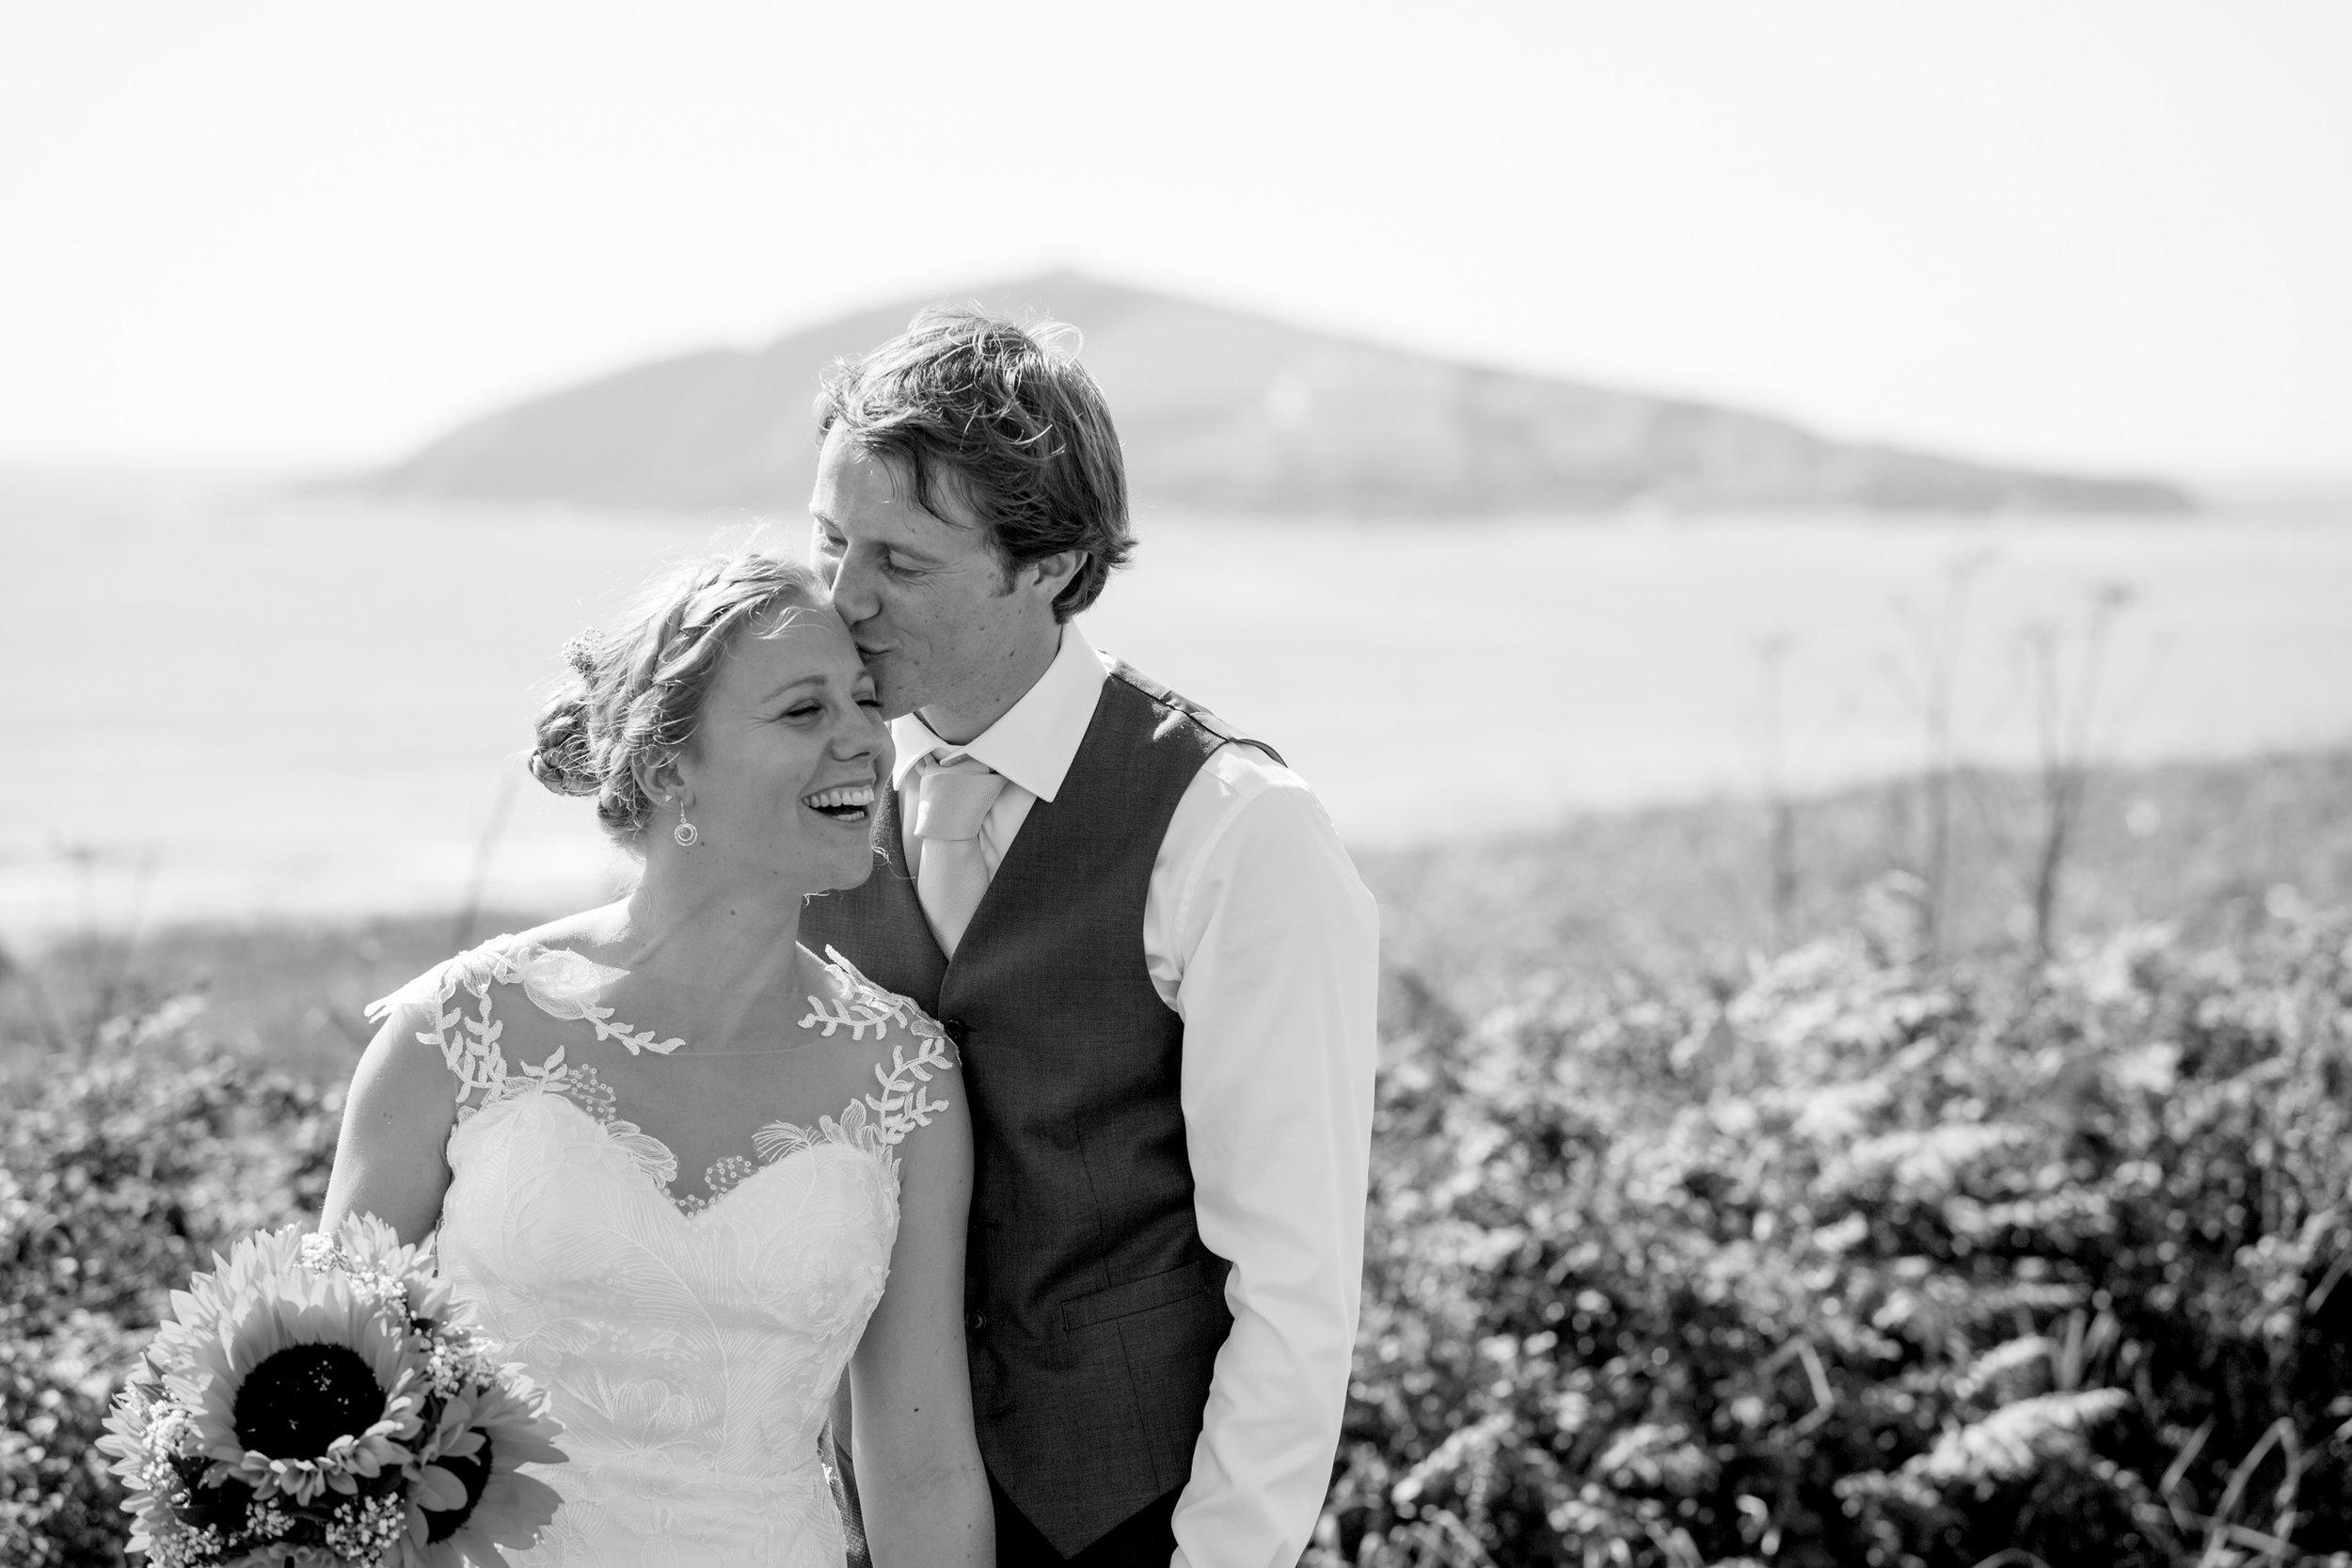 Bucklands-Tout-Saints-Hotel-Devon-Wedding-Photography-21.jpg